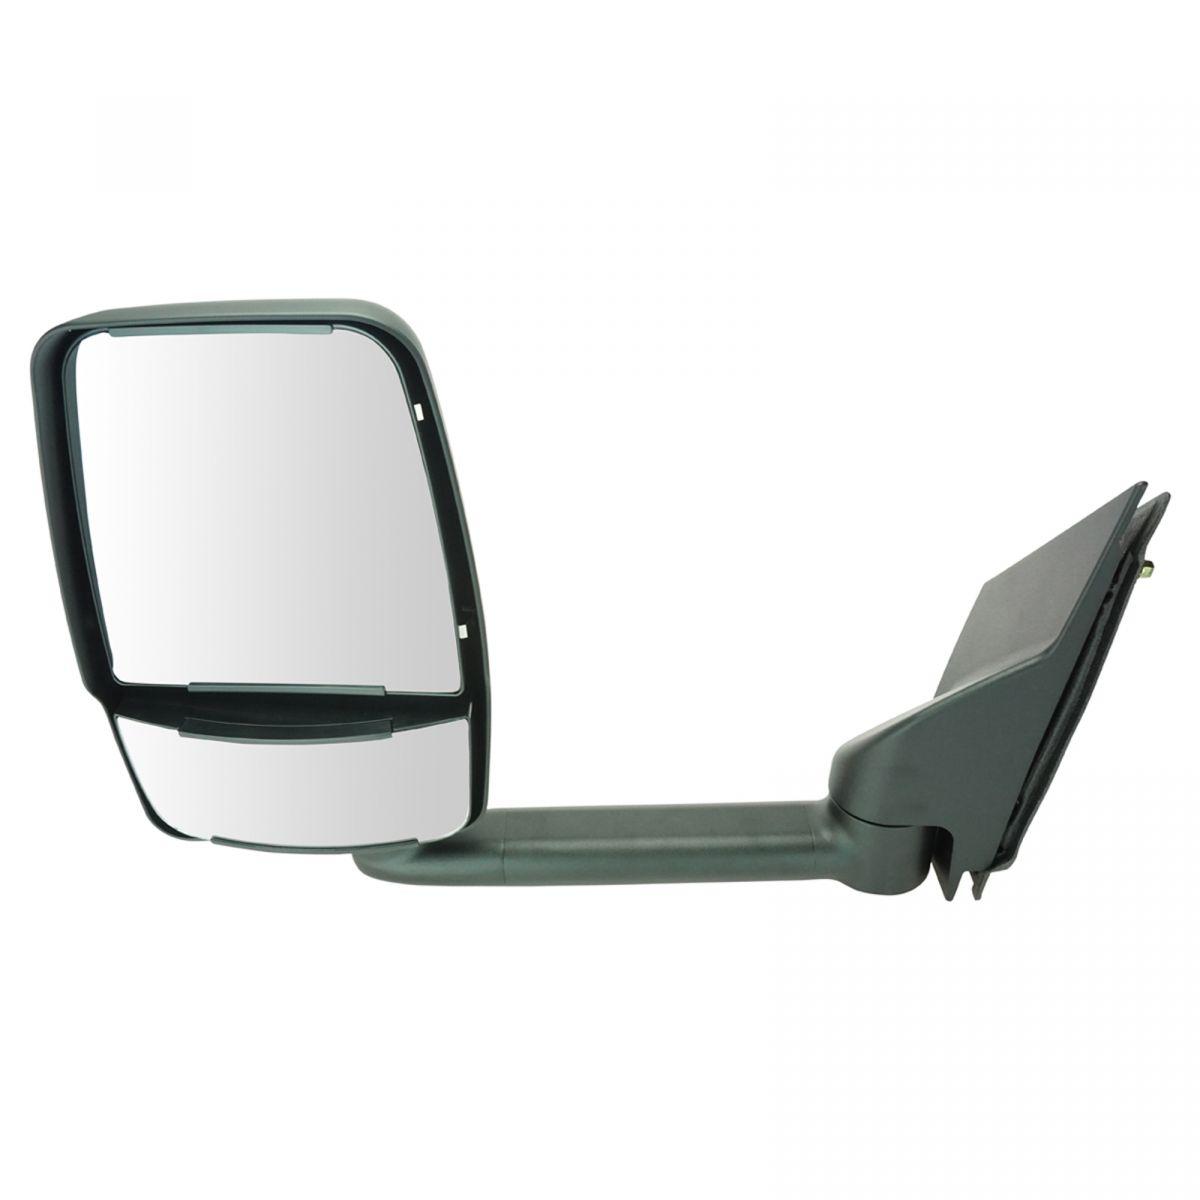 RH Pair of 03-17 Chevy Express Savana Van Textured Black Manual Tow Mirror LH